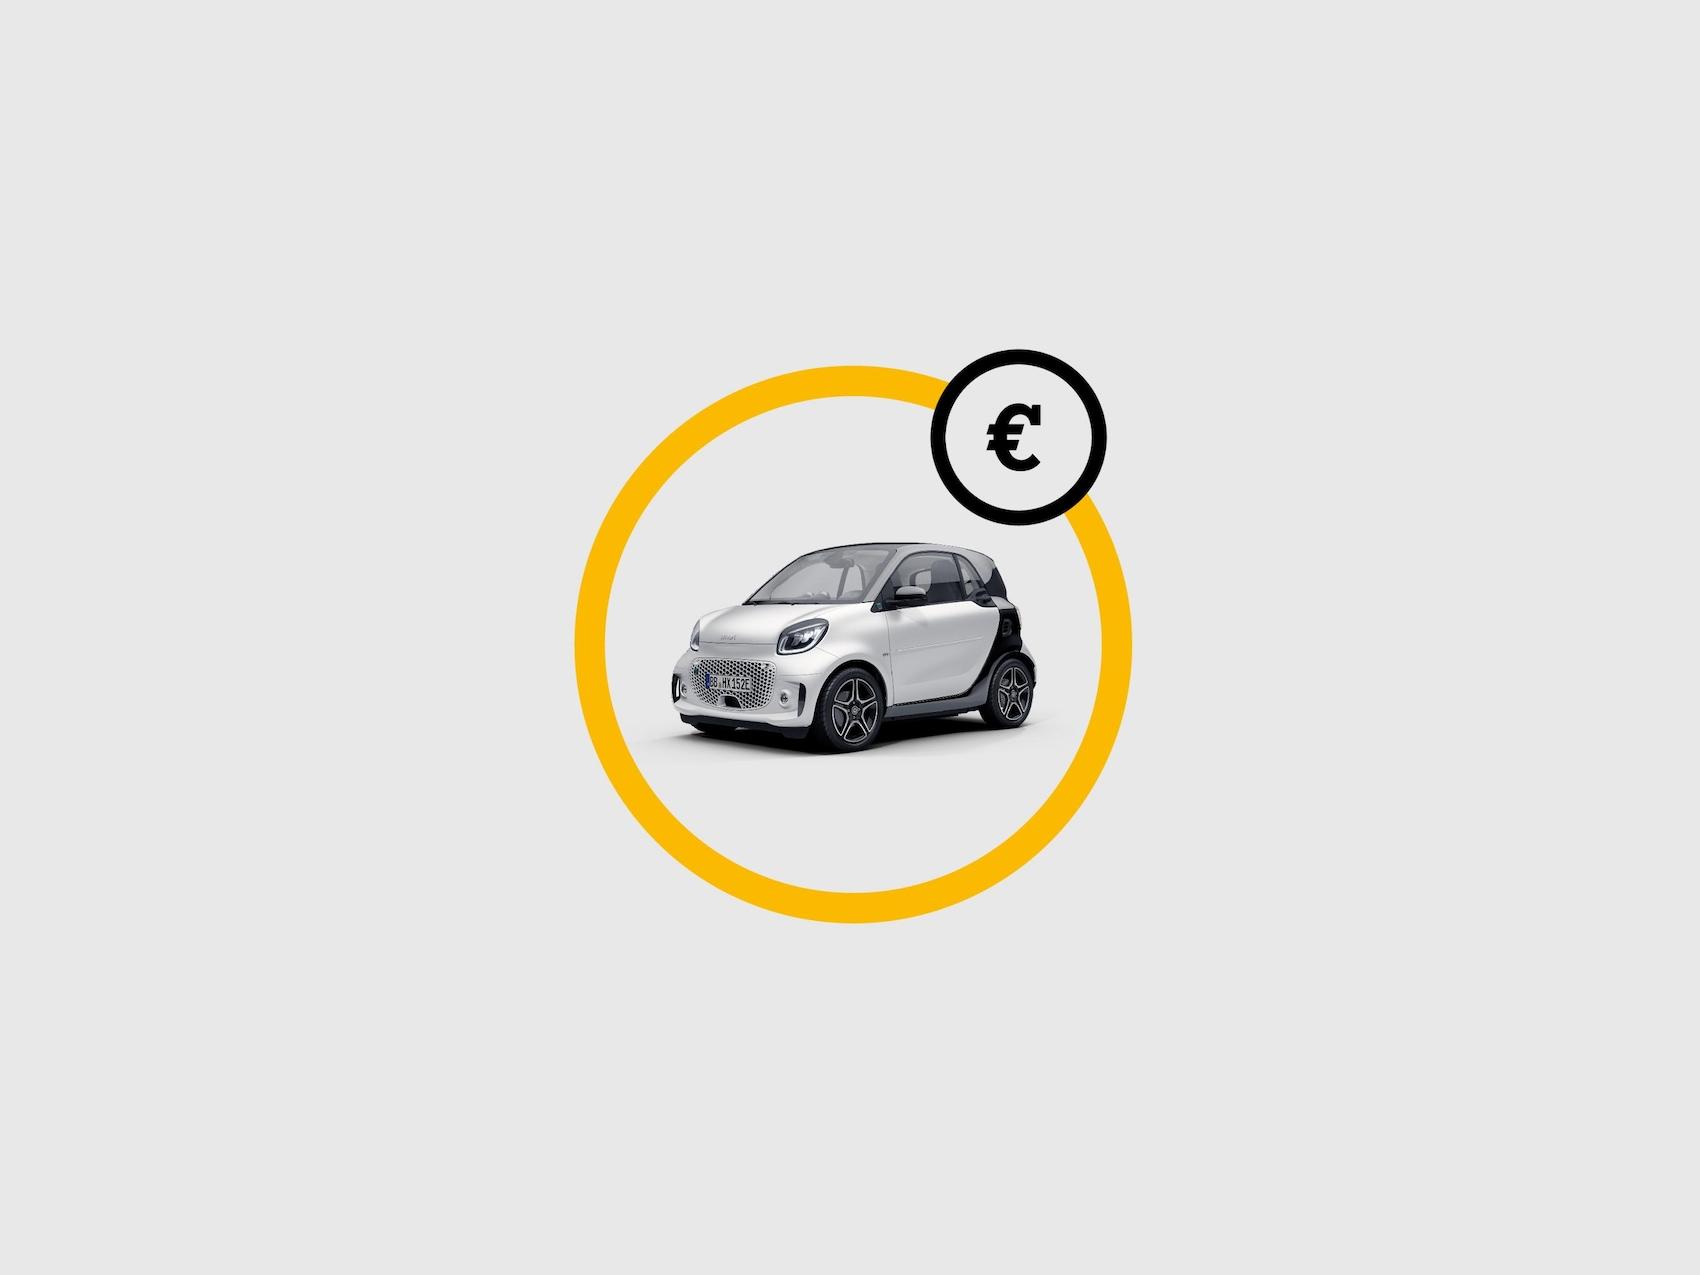 Servicios smart «ready to» – Función de pago